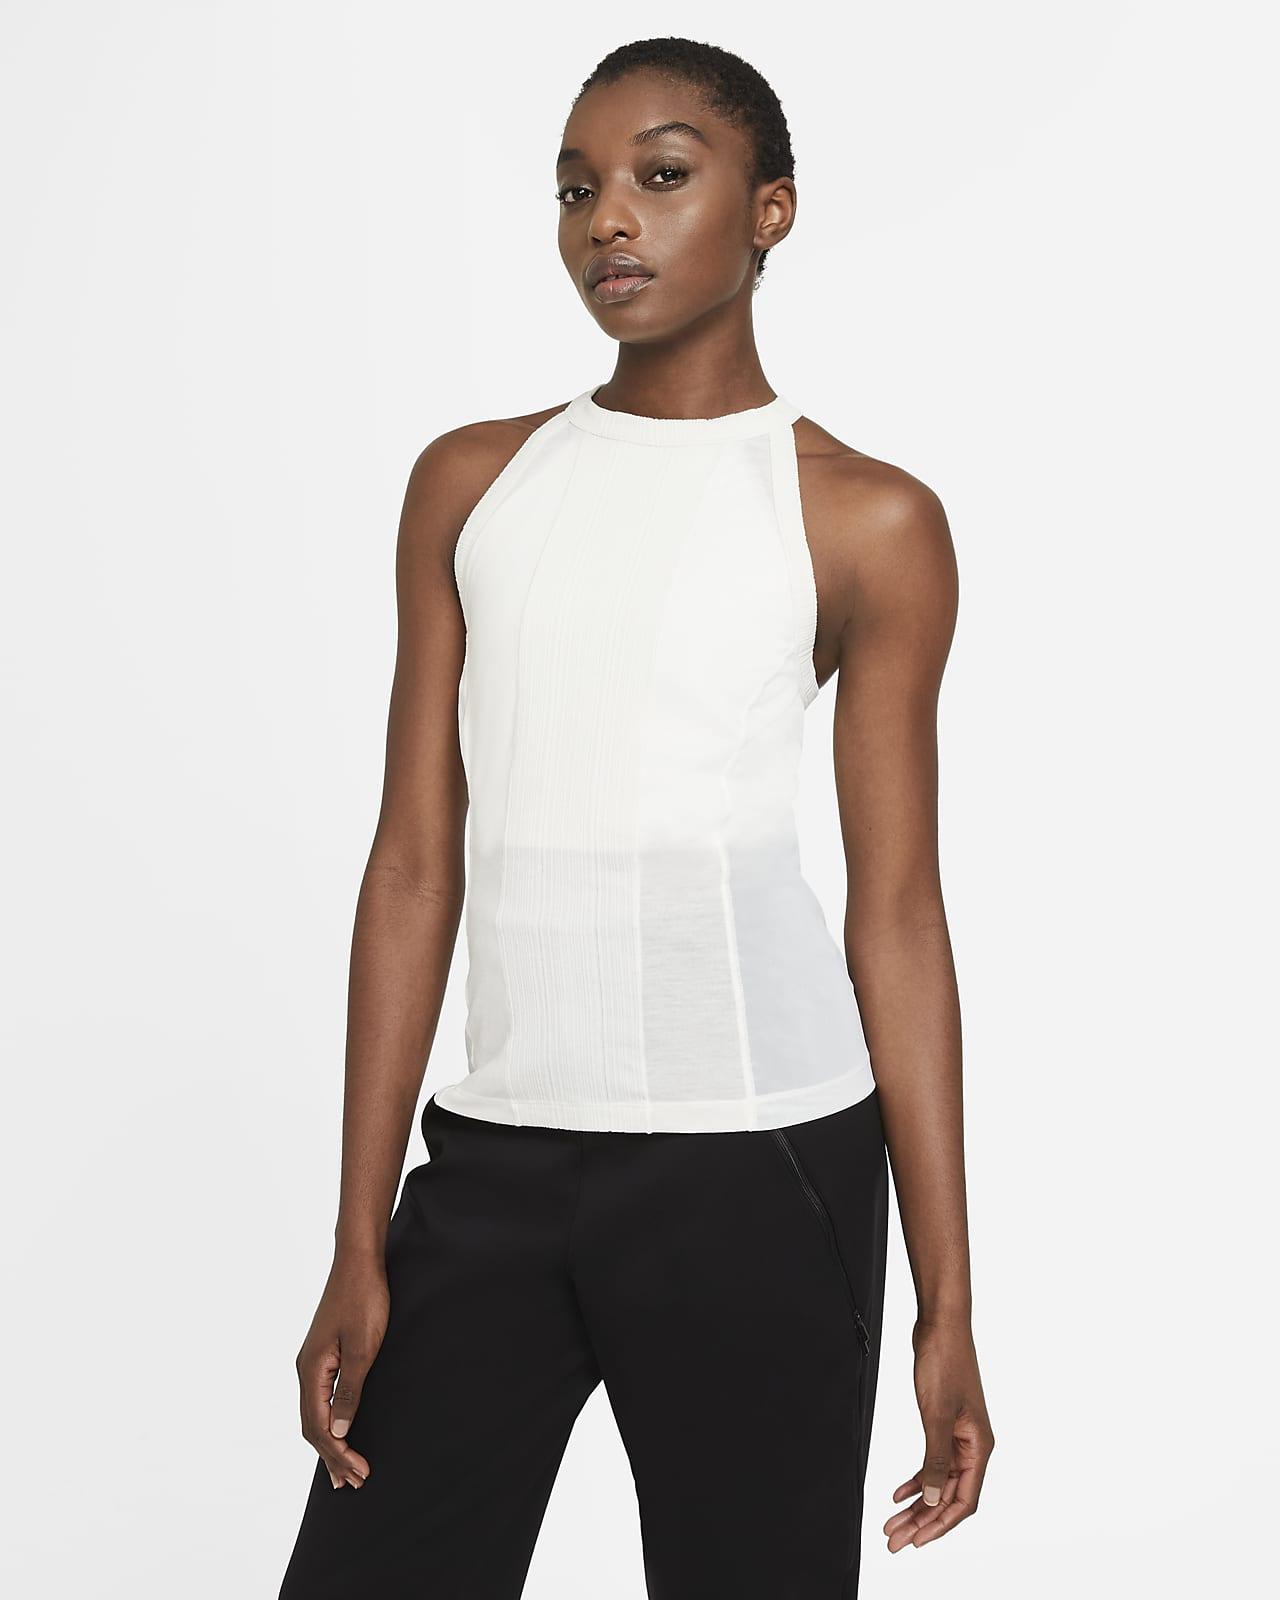 Nike City Ready Trainingstanktop für Damen